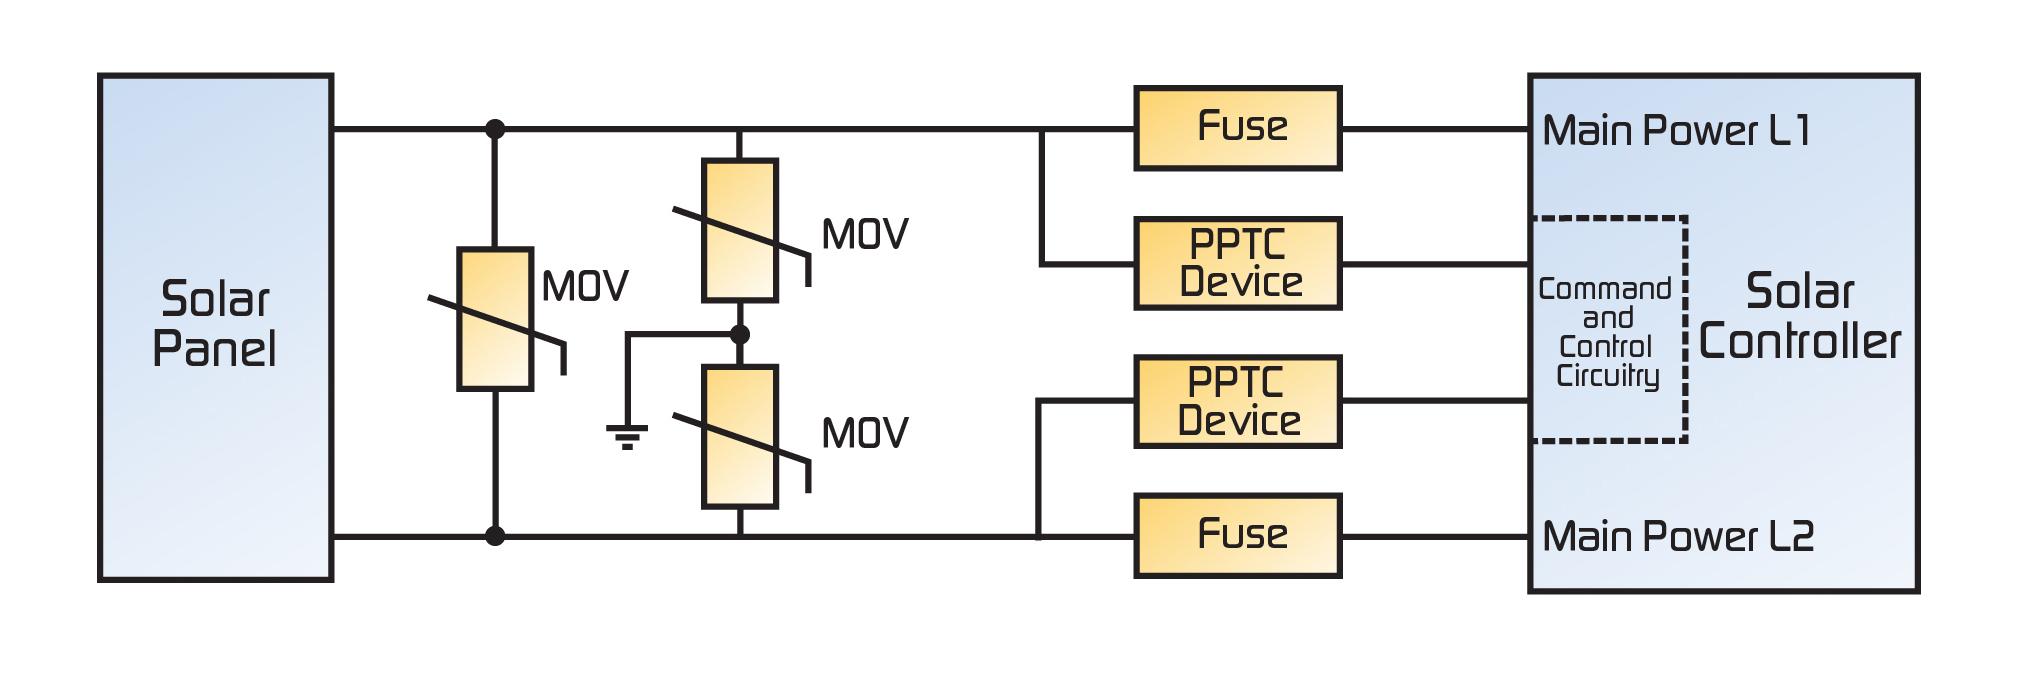 Tecp Psde Solar Fig on Mov Surge Protection Circuit Diagram